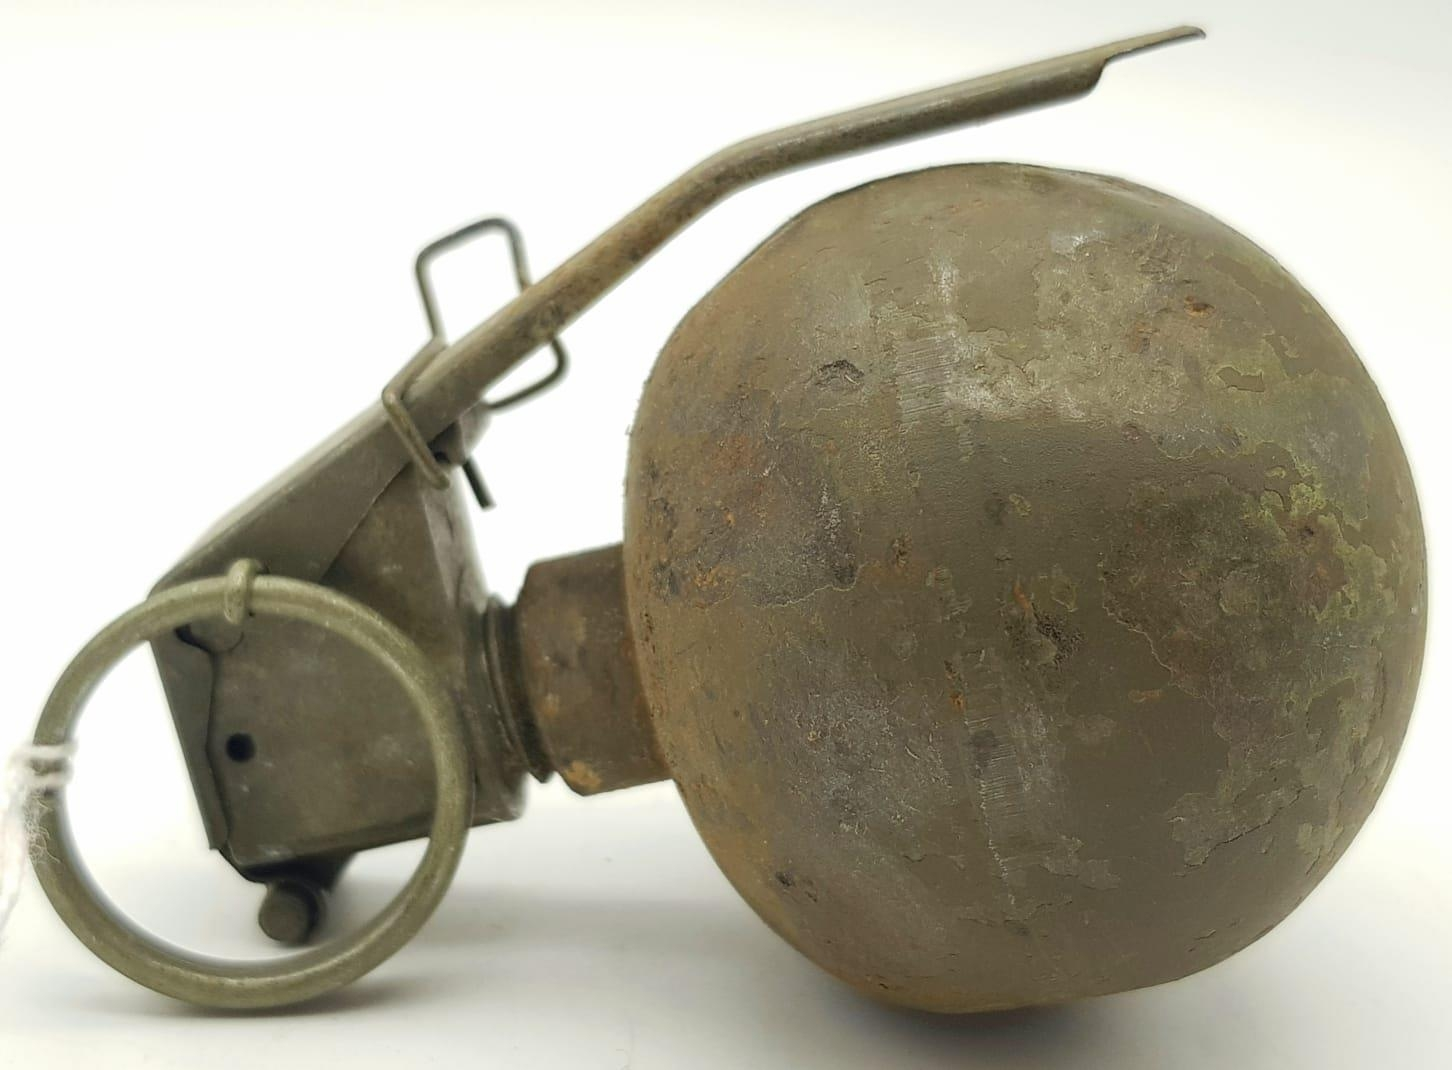 Vietnam War Era INERT US M.67 Grenade. The idea was that every all-American boy could throw a